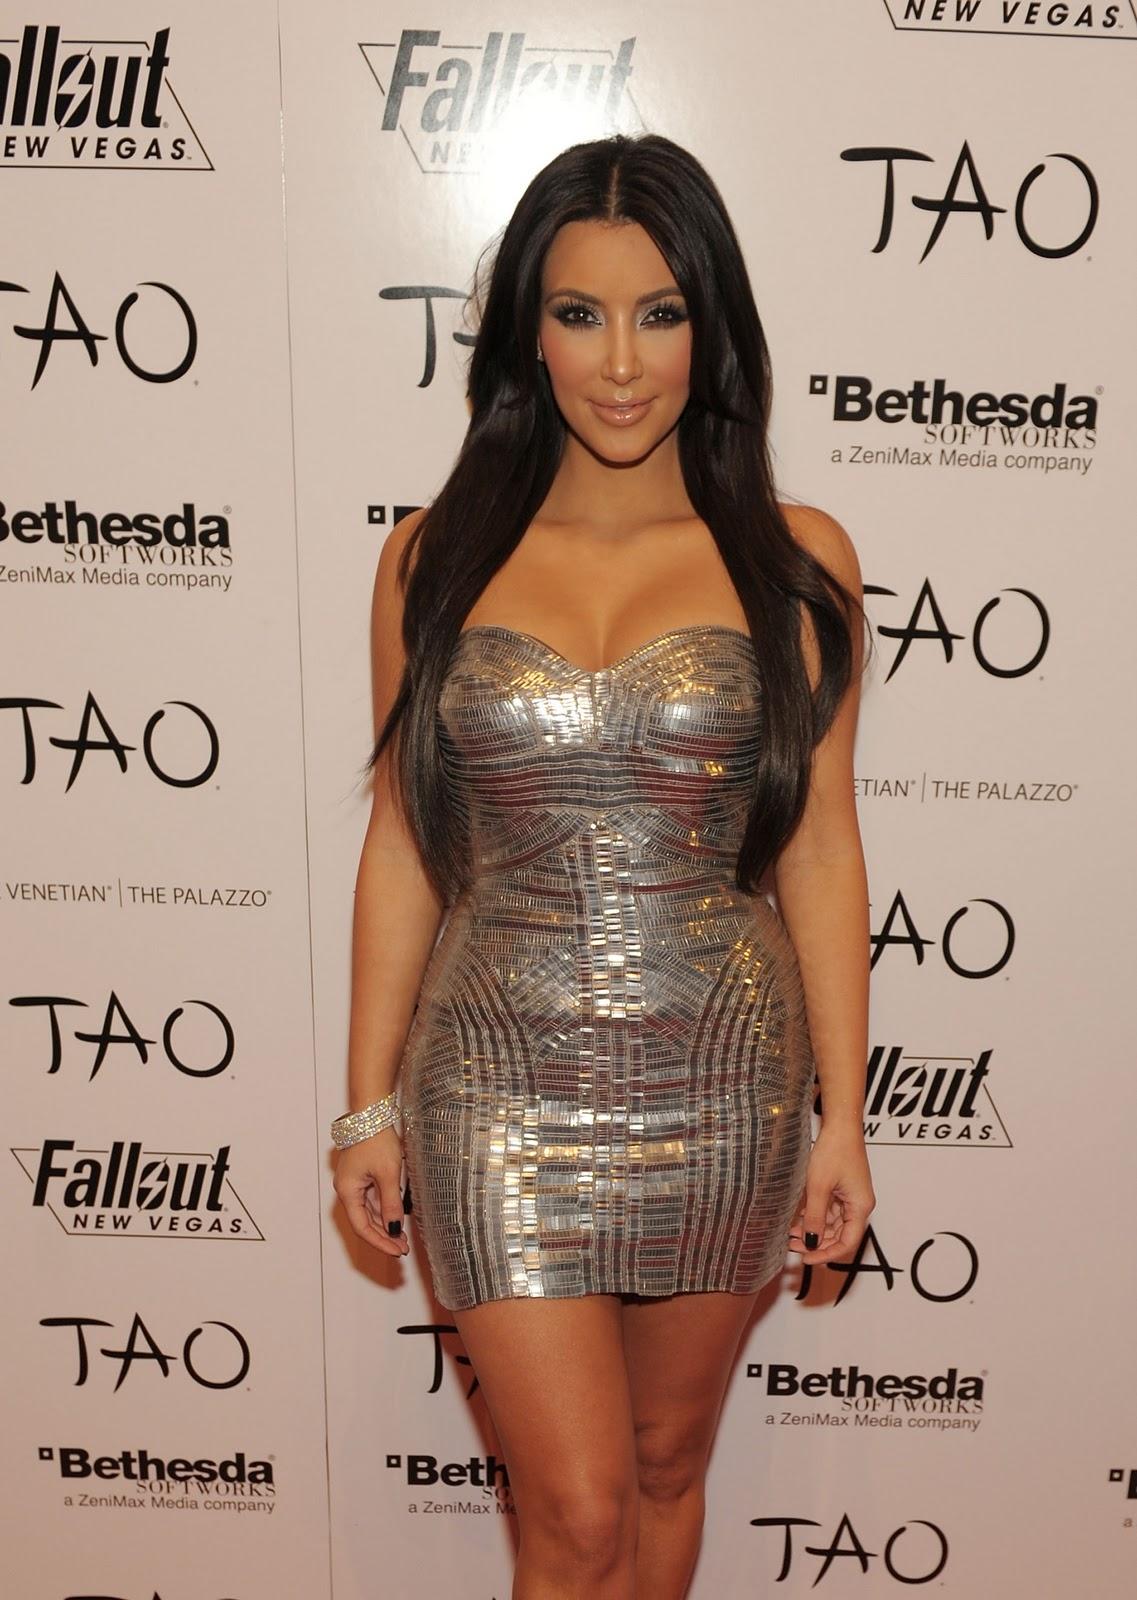 http://2.bp.blogspot.com/_4KxmFp2OOHI/TLvPxVp_CLI/AAAAAAAANeo/T7hY_hrNqNs/s1600/Kim+Kardashian+celebrates+her+birthday+at+TAO+with+FALLOUT+NEW+VEGAS.JPG